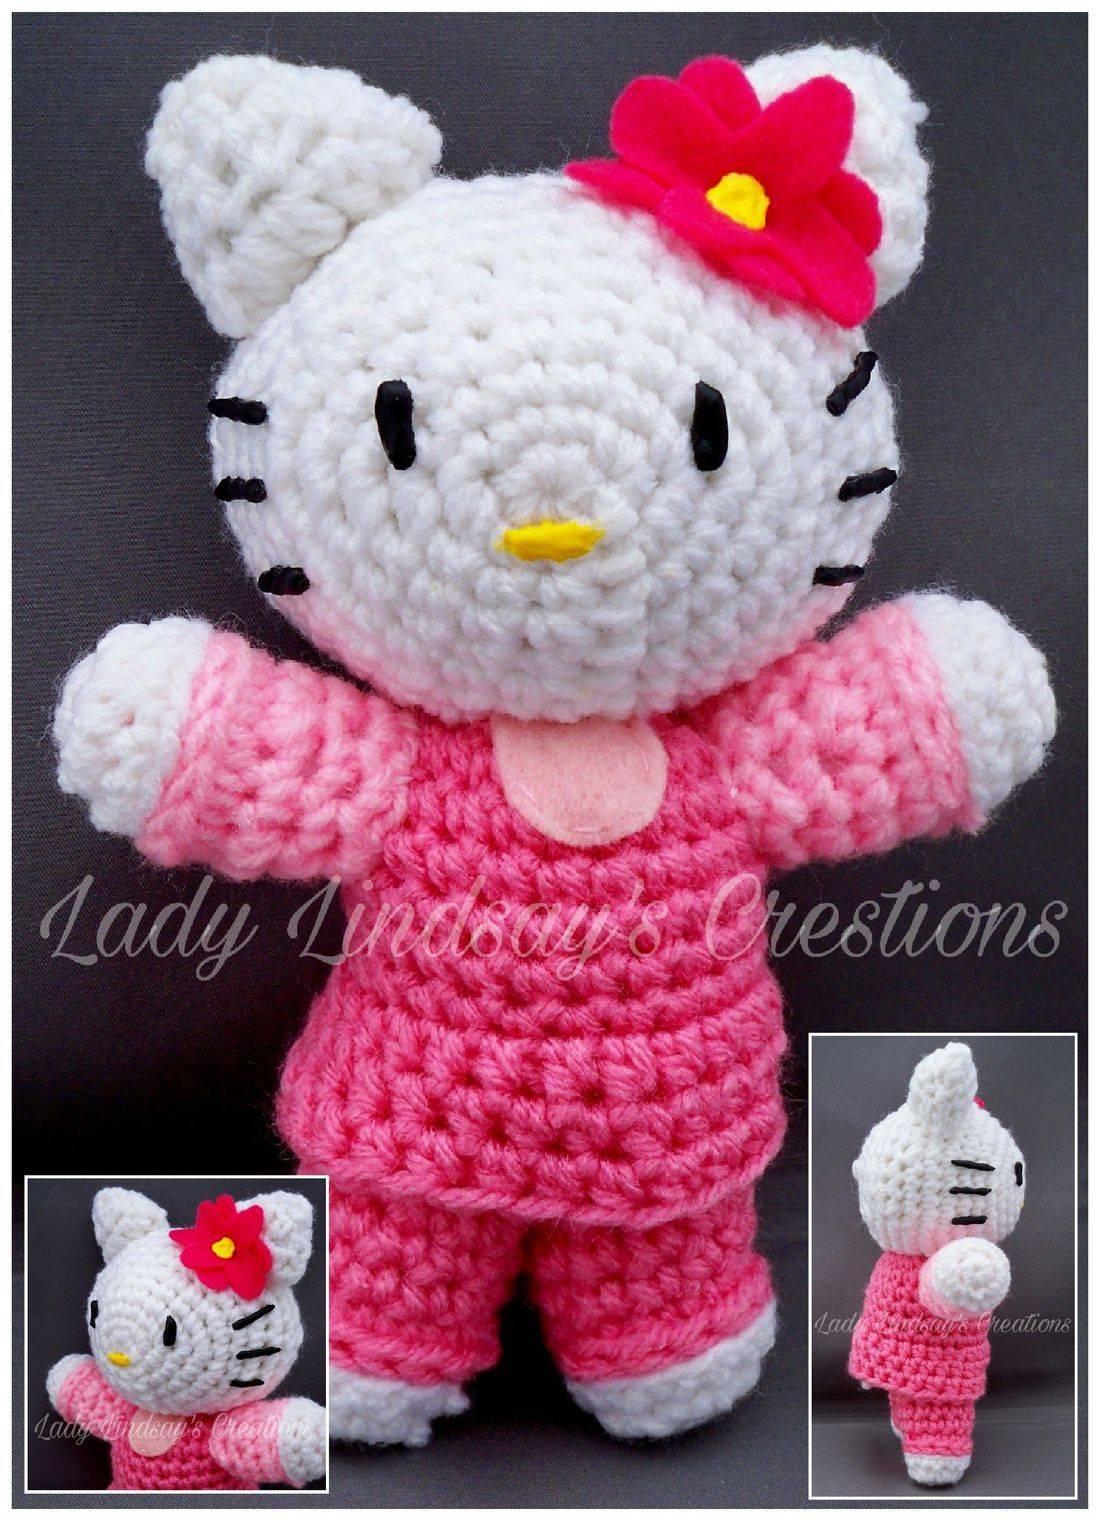 Hello Kitty, HK, Amigurumi, Plush, Crochet, Handmade, Doll,  anime, kawaii, otaku, nerd, geek, manga, comicbook, Etsy, ShopSmall